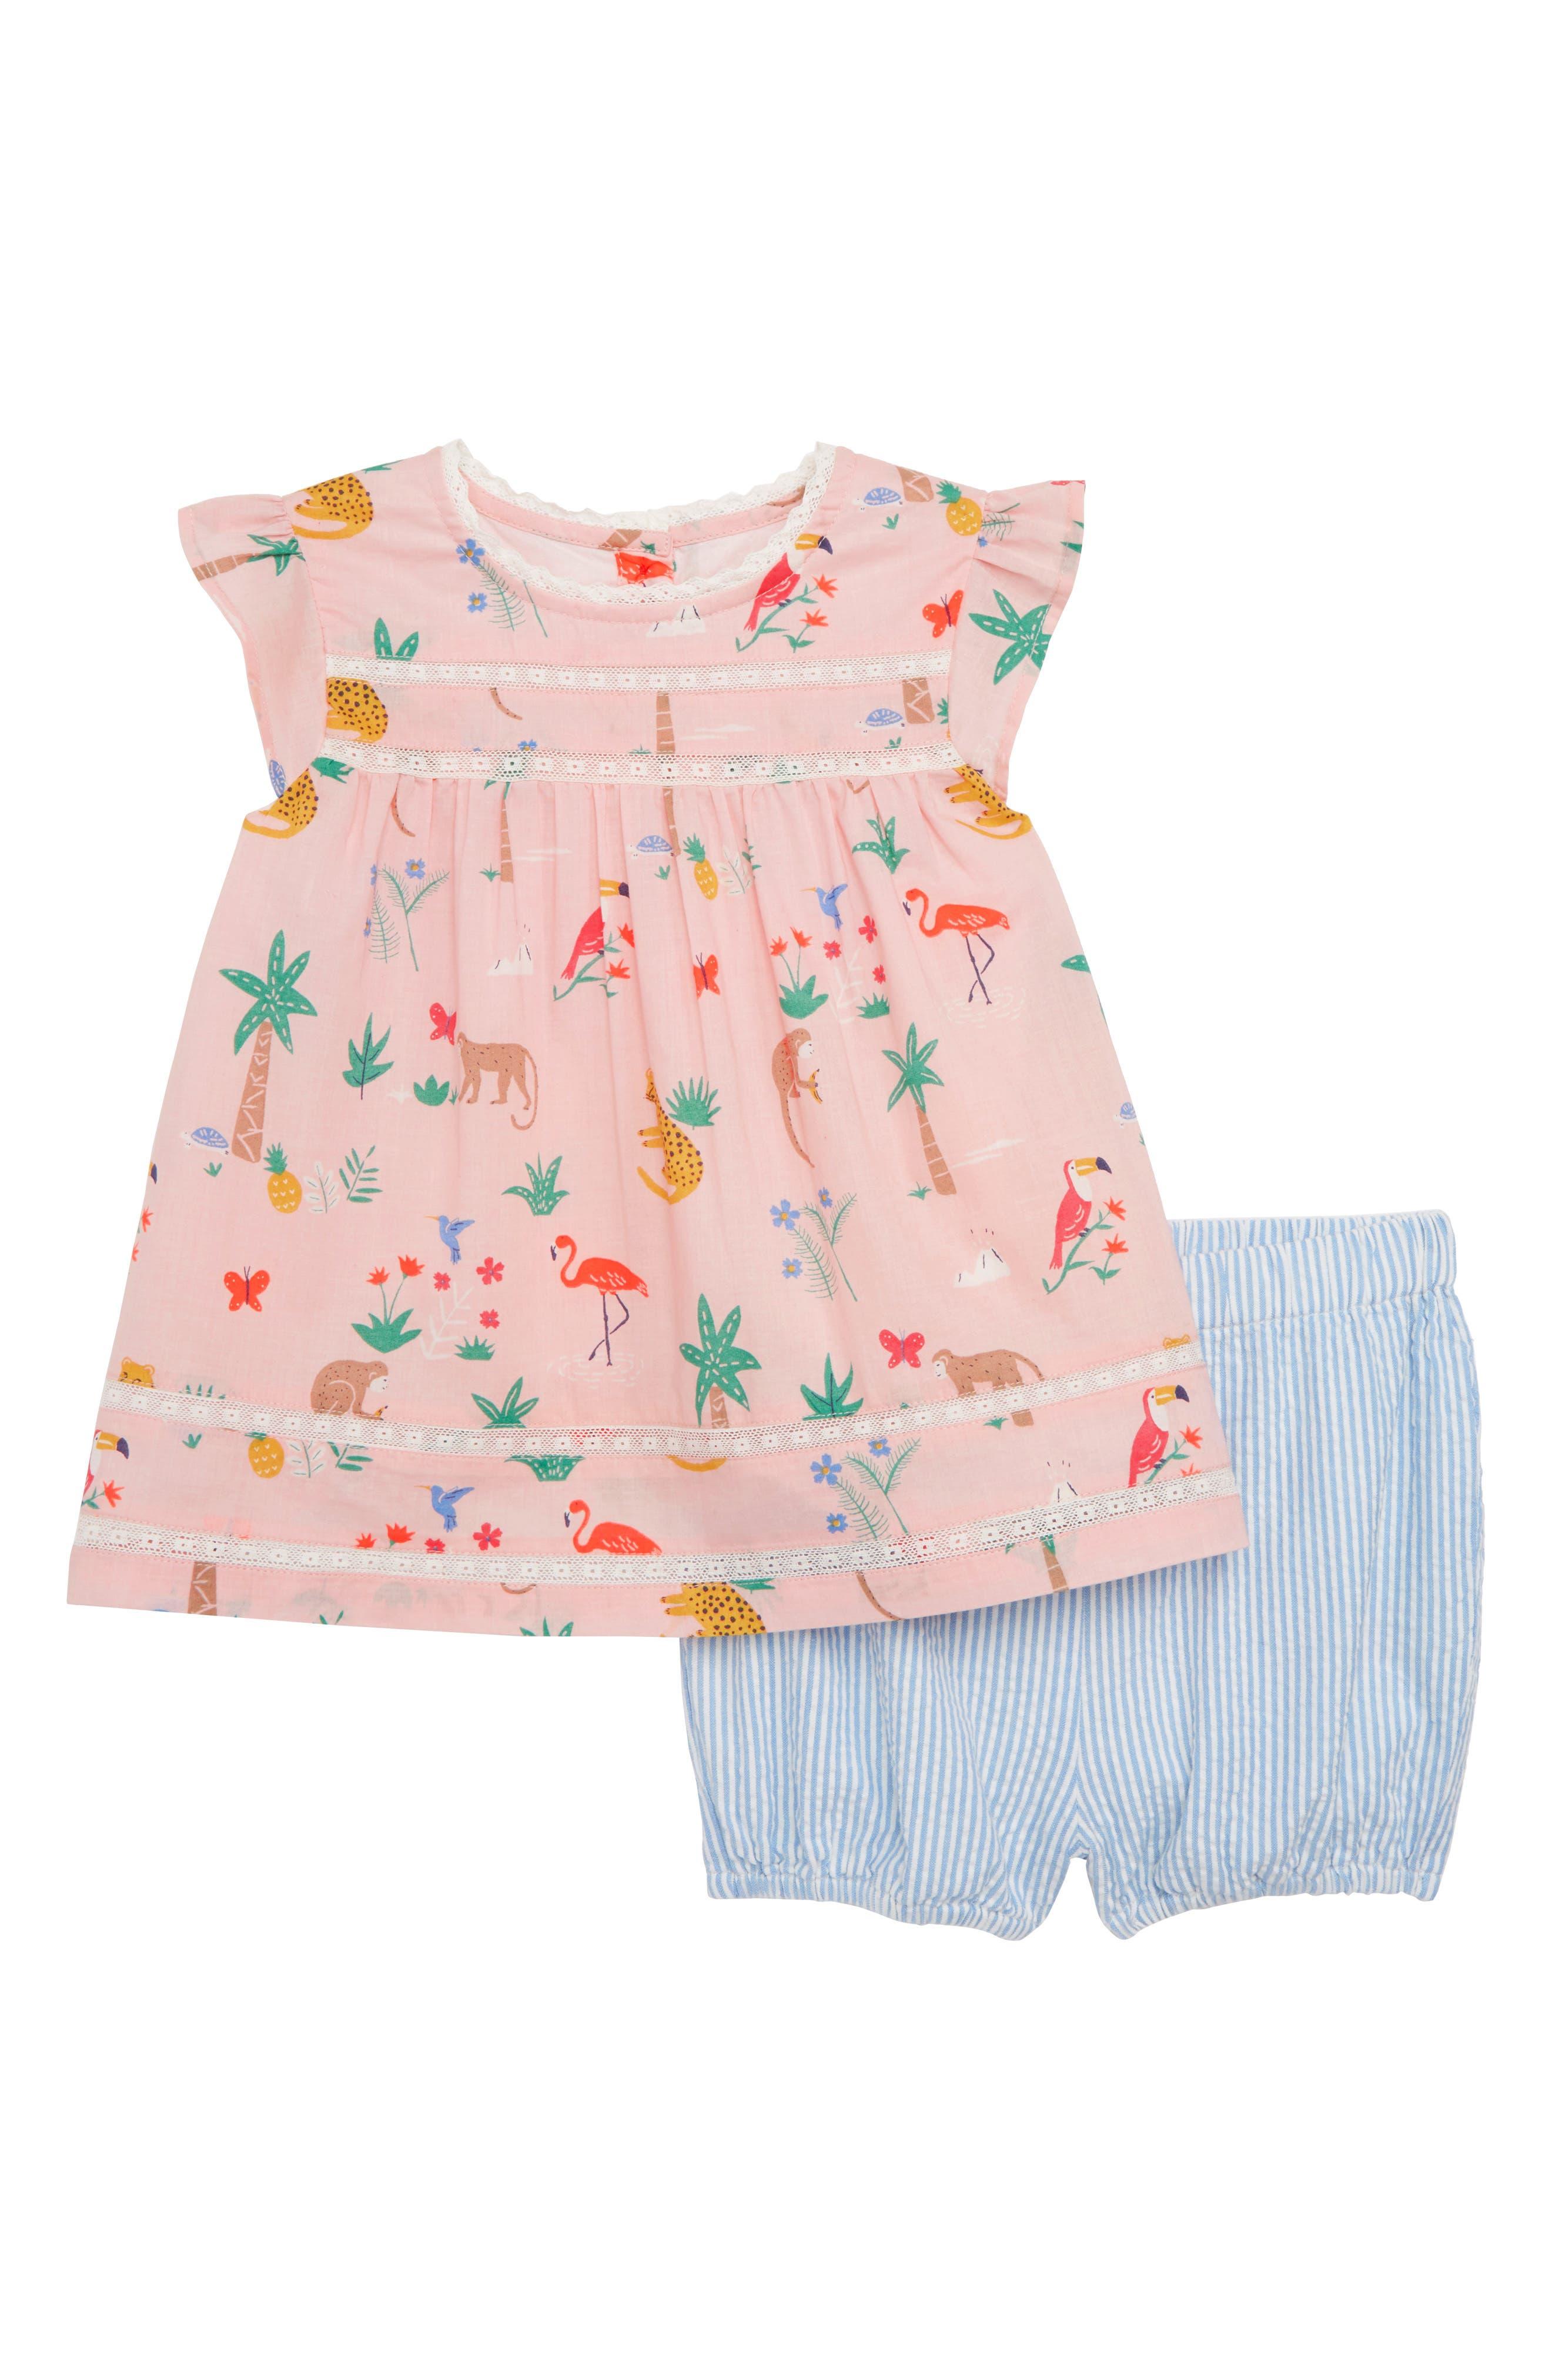 Sunny Days Top & Shorts Set,                         Main,                         color, Multi Island Friends